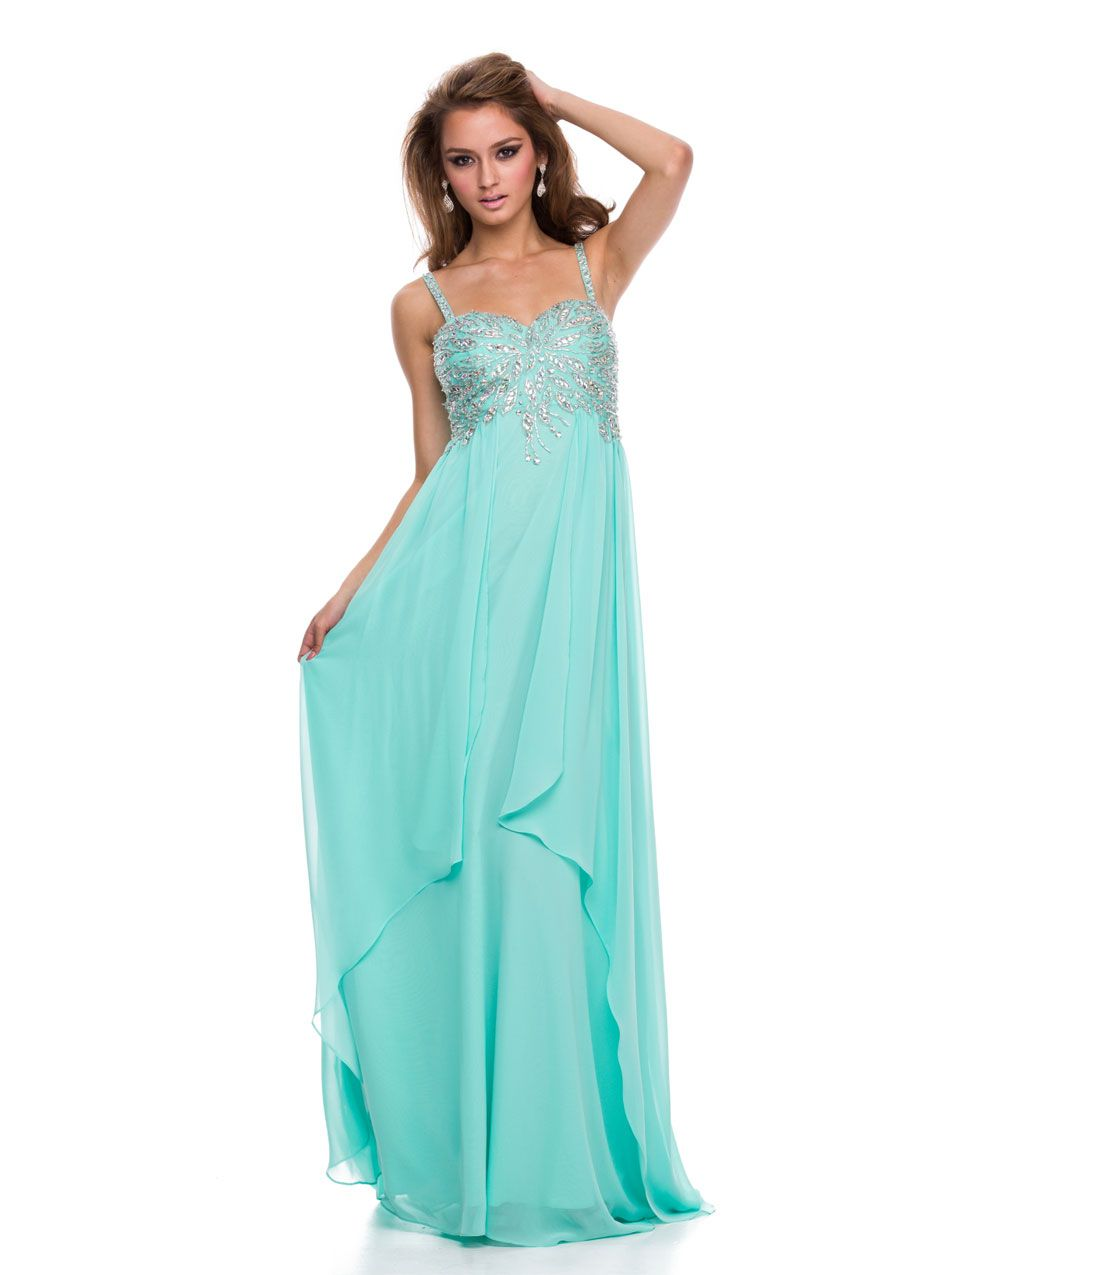 2014 Prom Dresses - Mint Green Tiered Chiffon & Beaded Gown - Unique Vintage - Prom dresses, retro dresses, retro swimsuits.